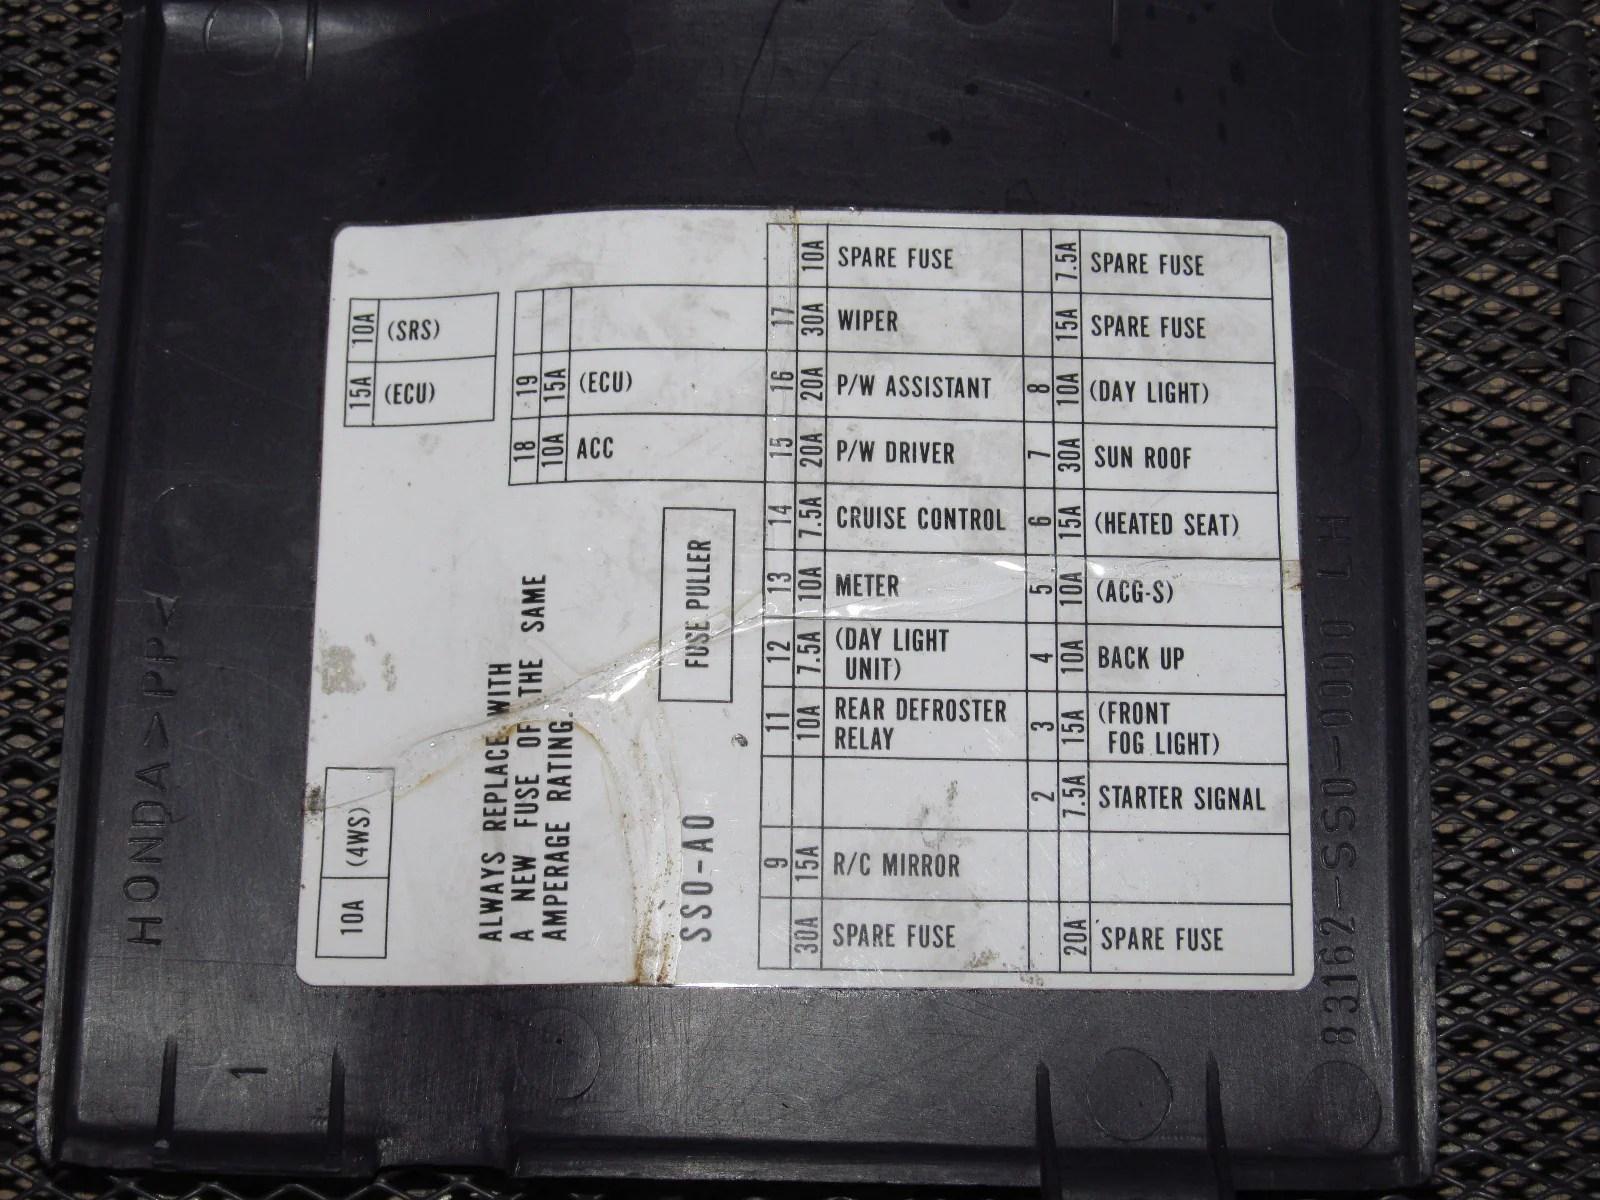 92 96 prelude fuse box wiring diagram centre mix 92 93 94 95 96 honda prelude [ 1600 x 1200 Pixel ]